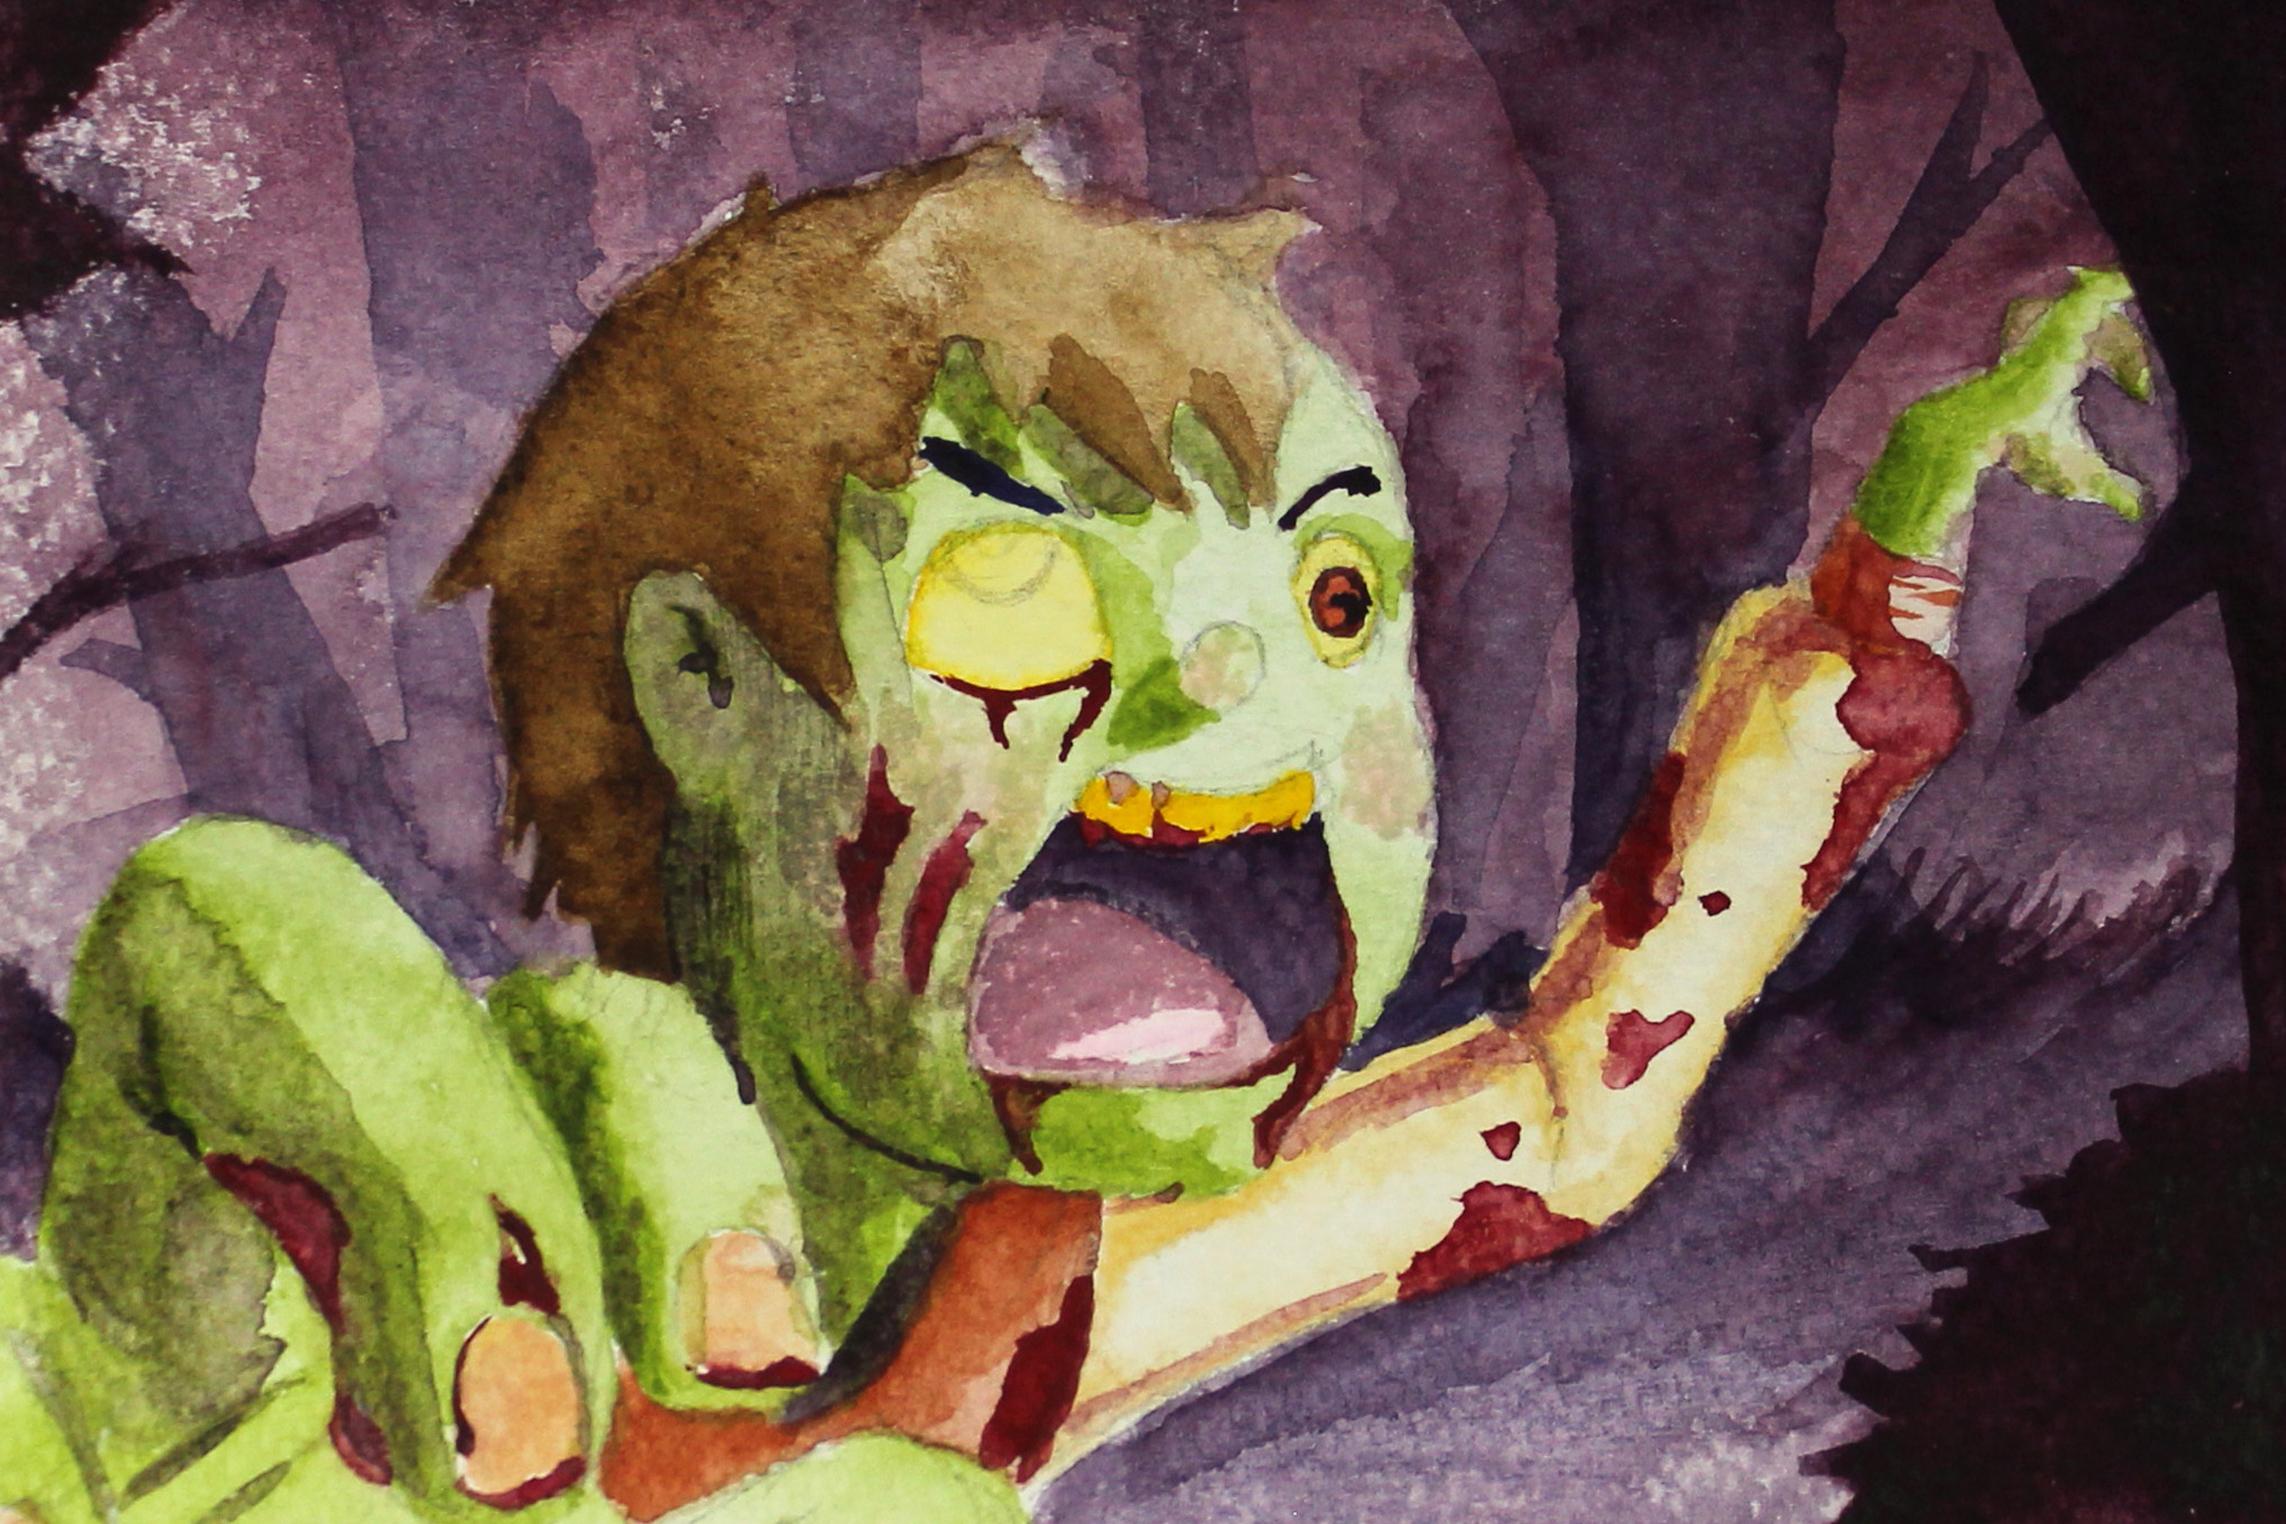 Zombie kid 6x4.jpg